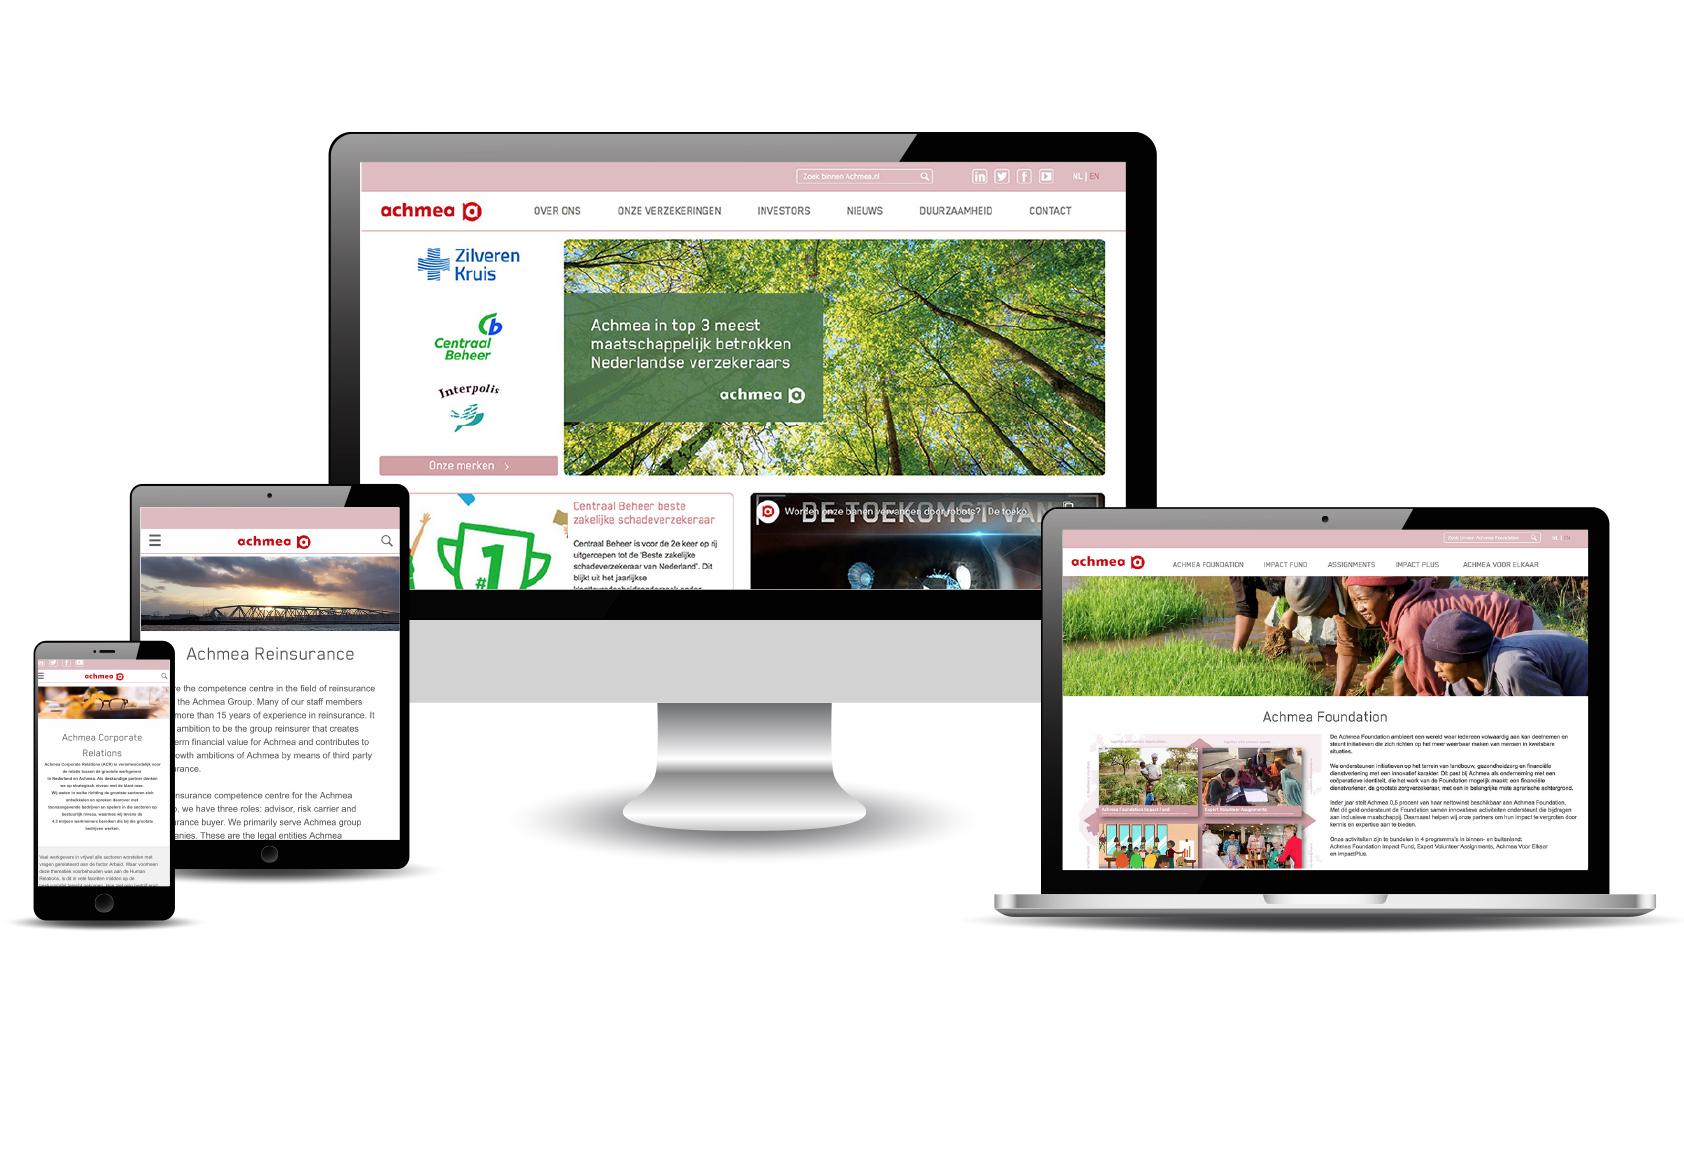 https://margowestgeest.nl/wp-content/uploads/2020/05/Websites_Achmea-1.jpg